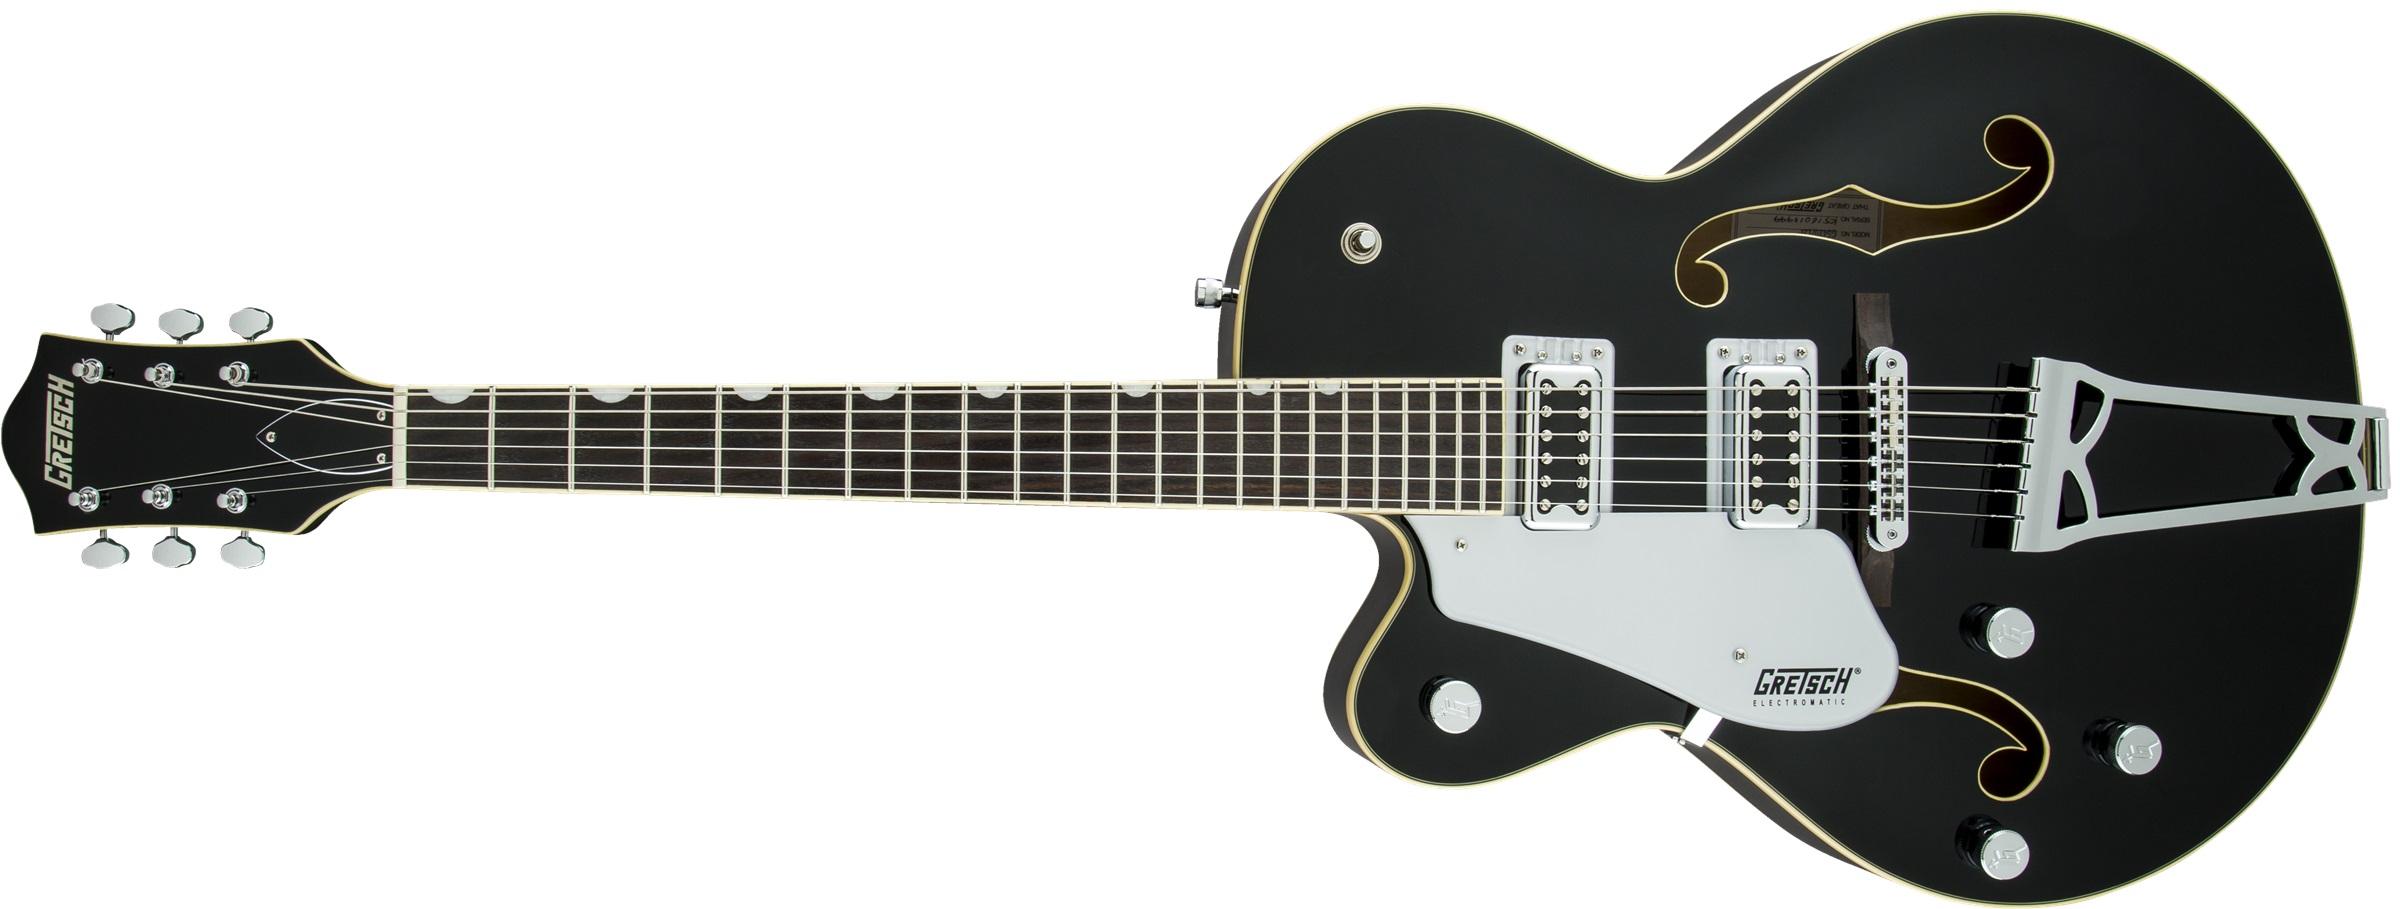 Gretsch G5420LH Electromatic BK